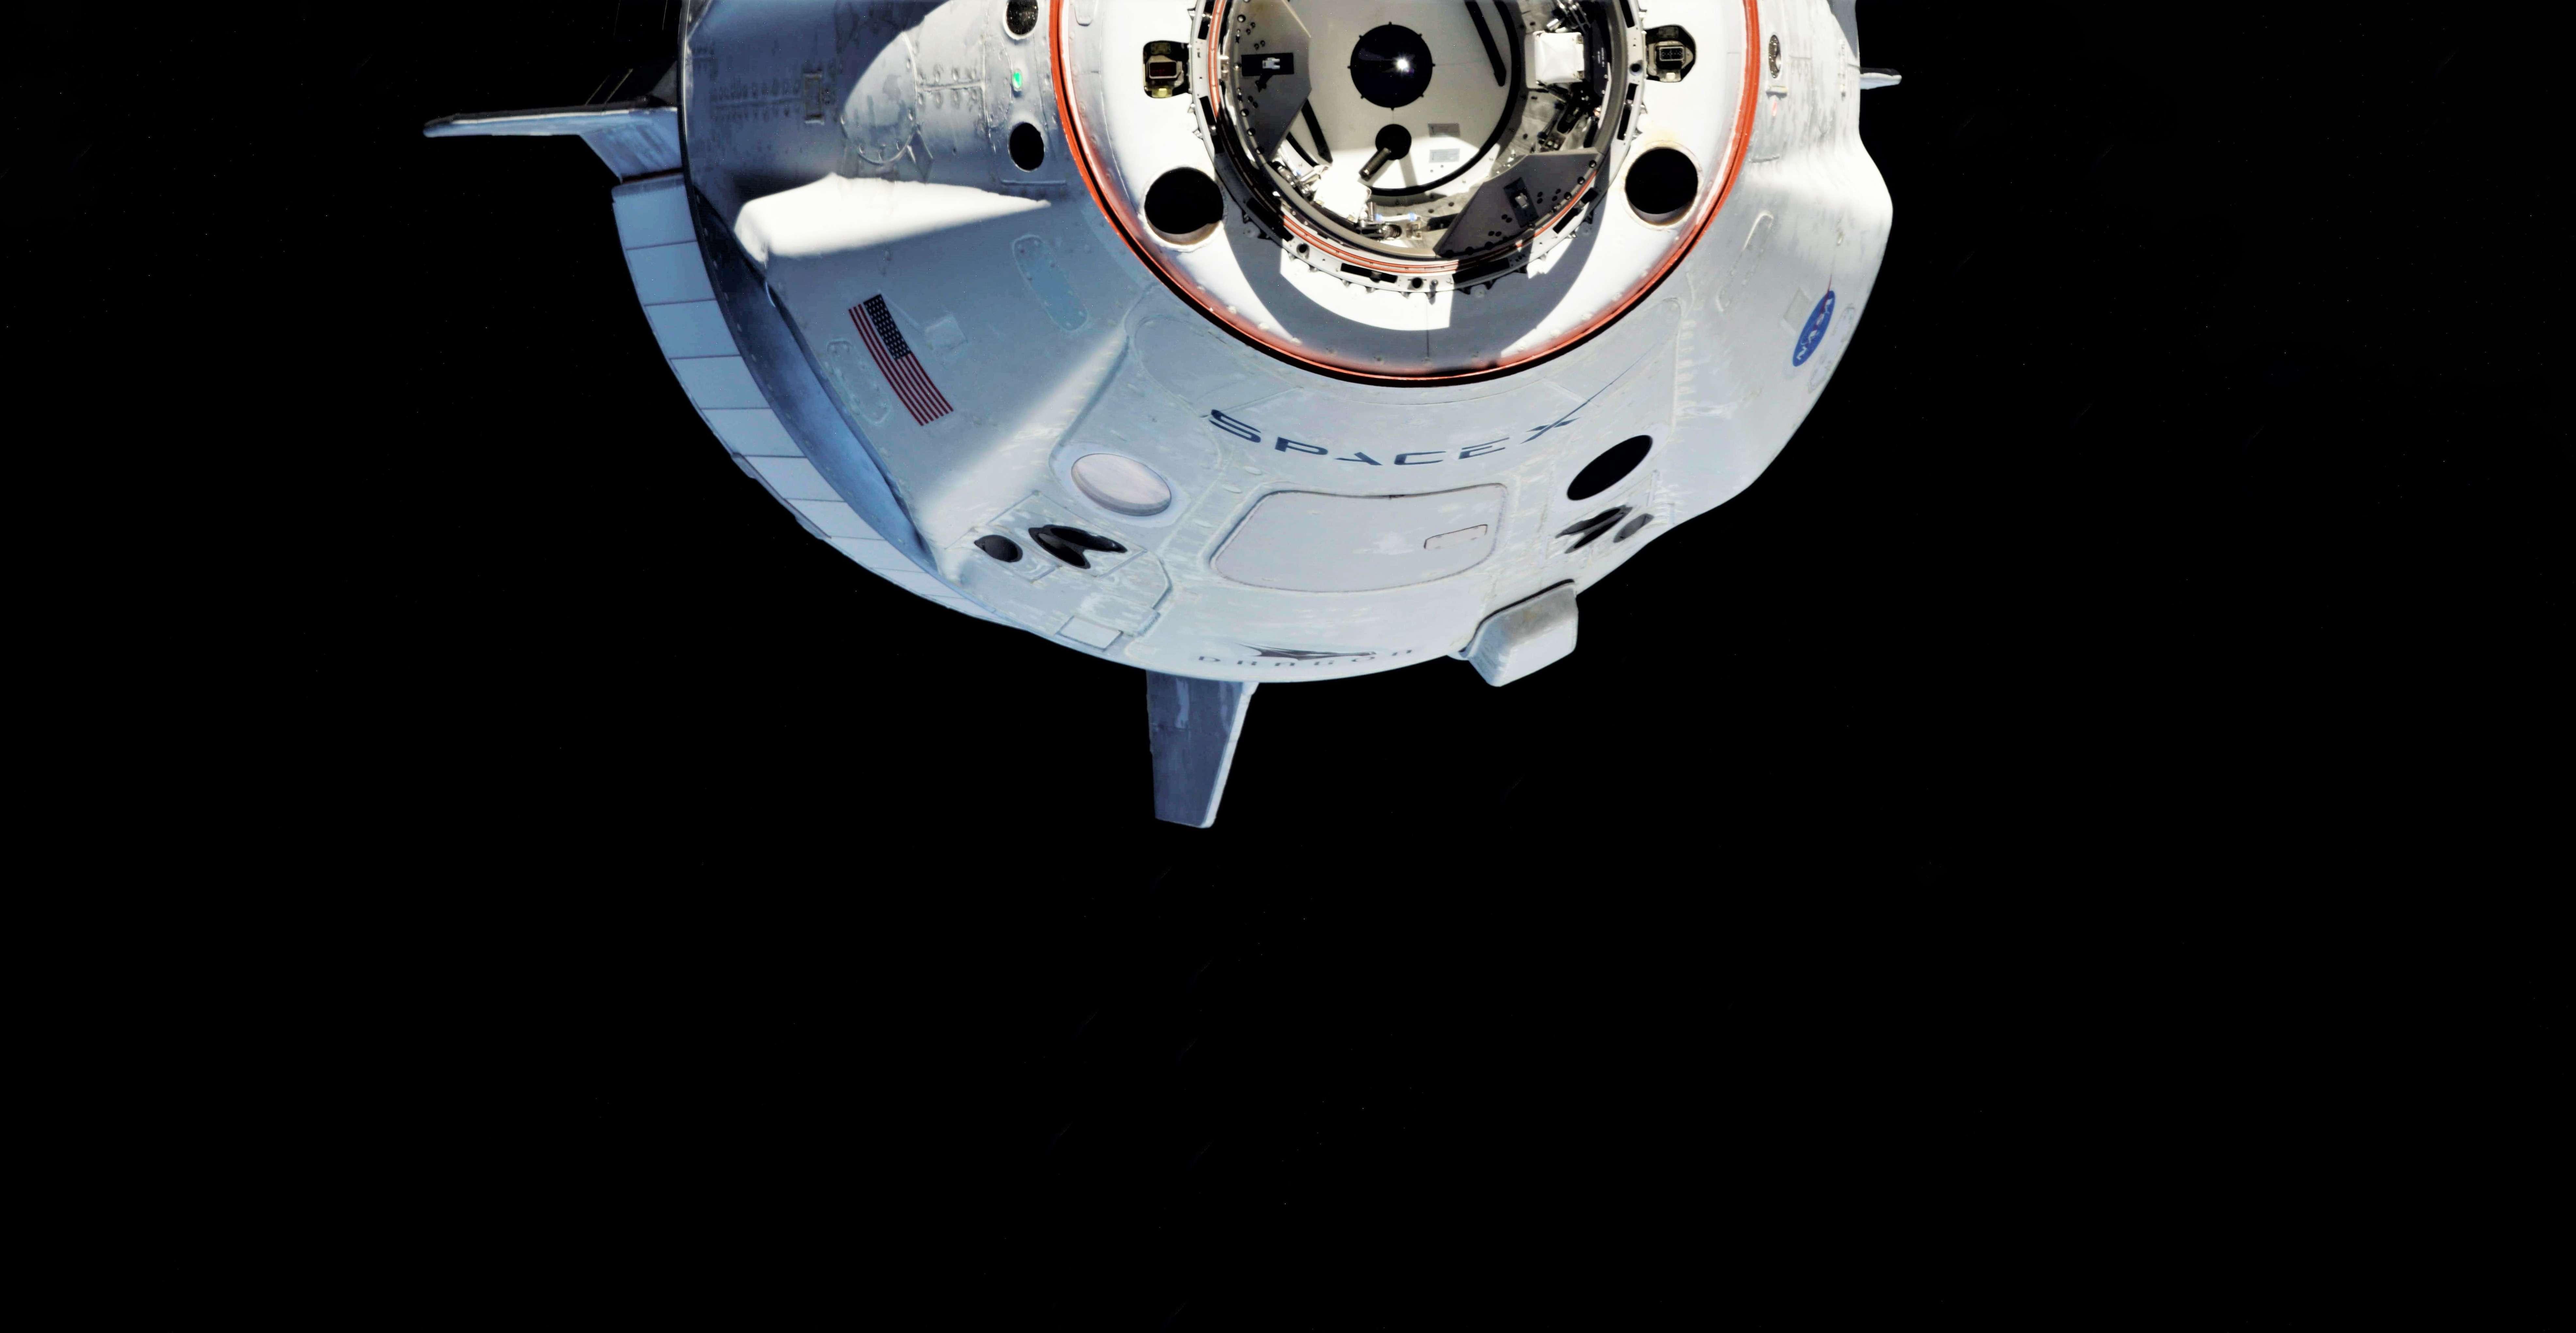 Crew Dragon DM-1 ISS arrival 030319 (Oleg Kononenko) 2 edit 5 (c)